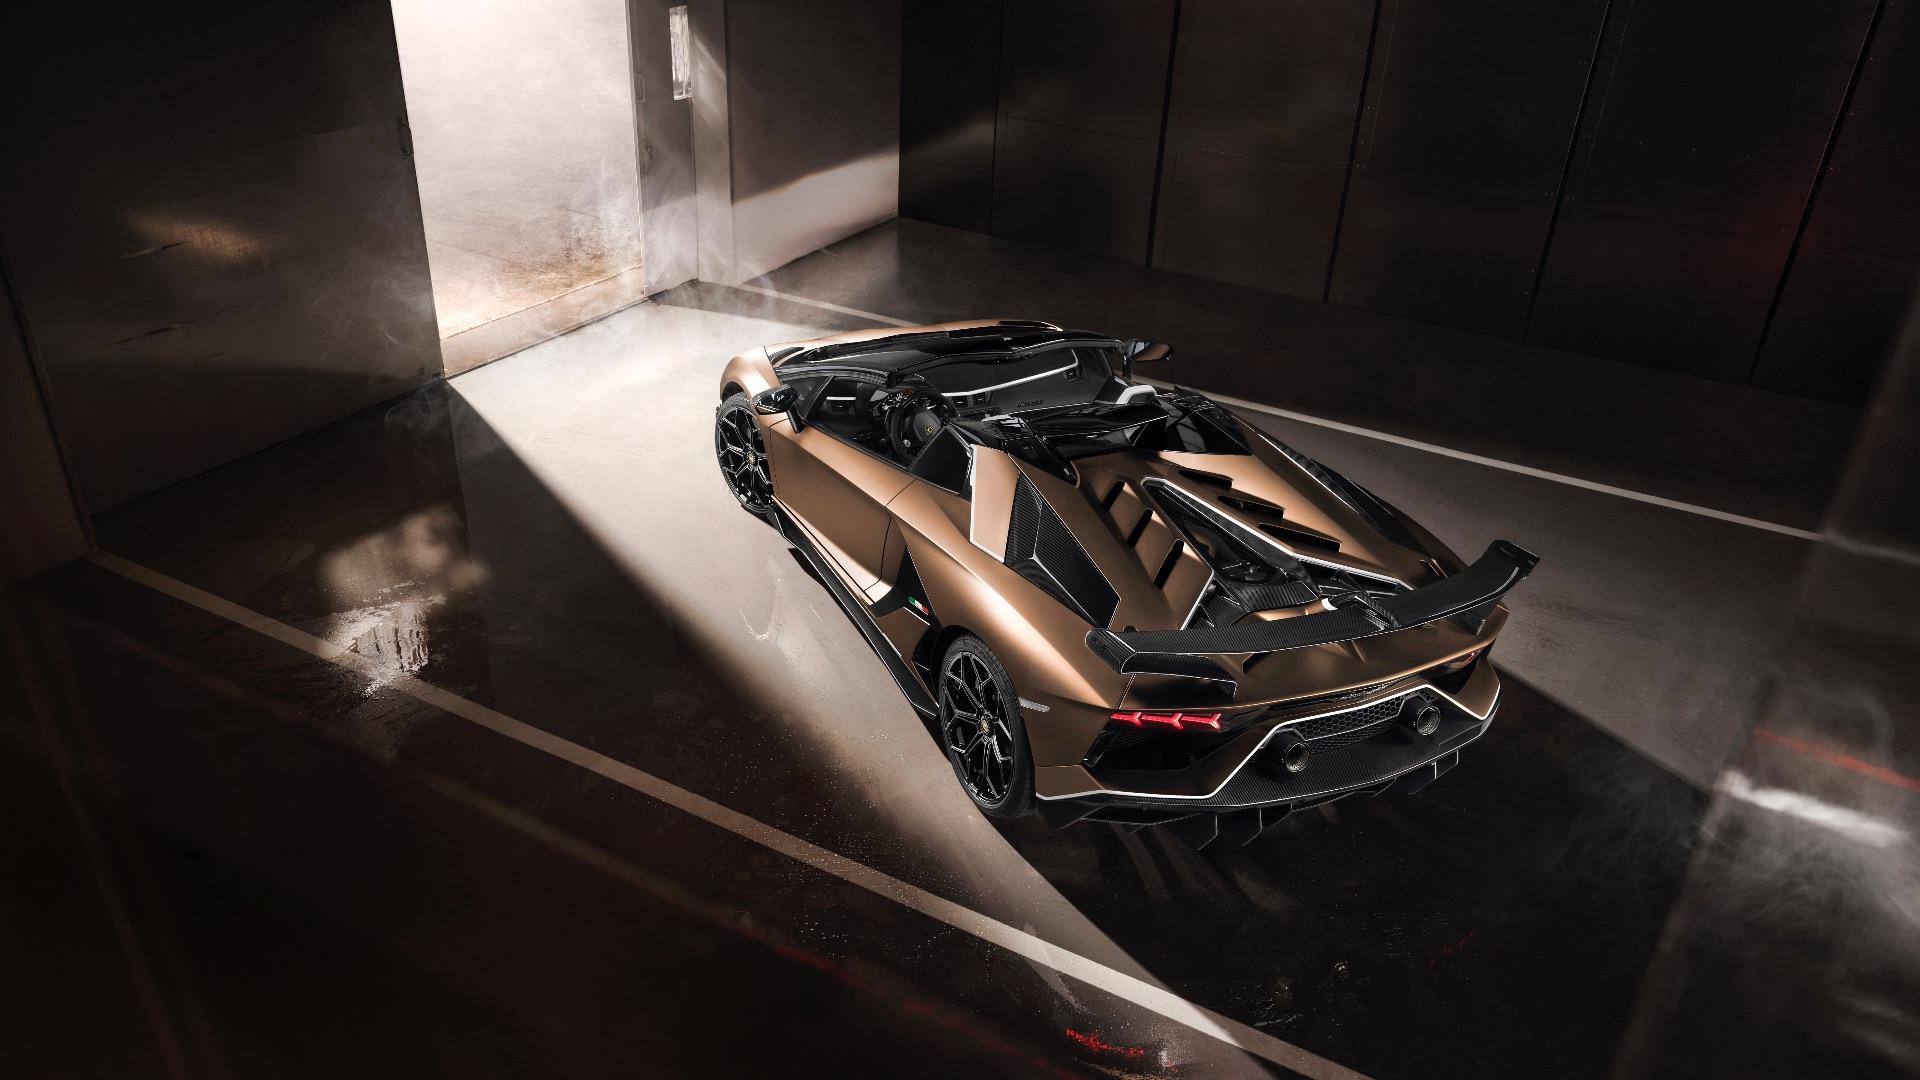 Lamborghini Aventador Svj Roadster 2020 Review